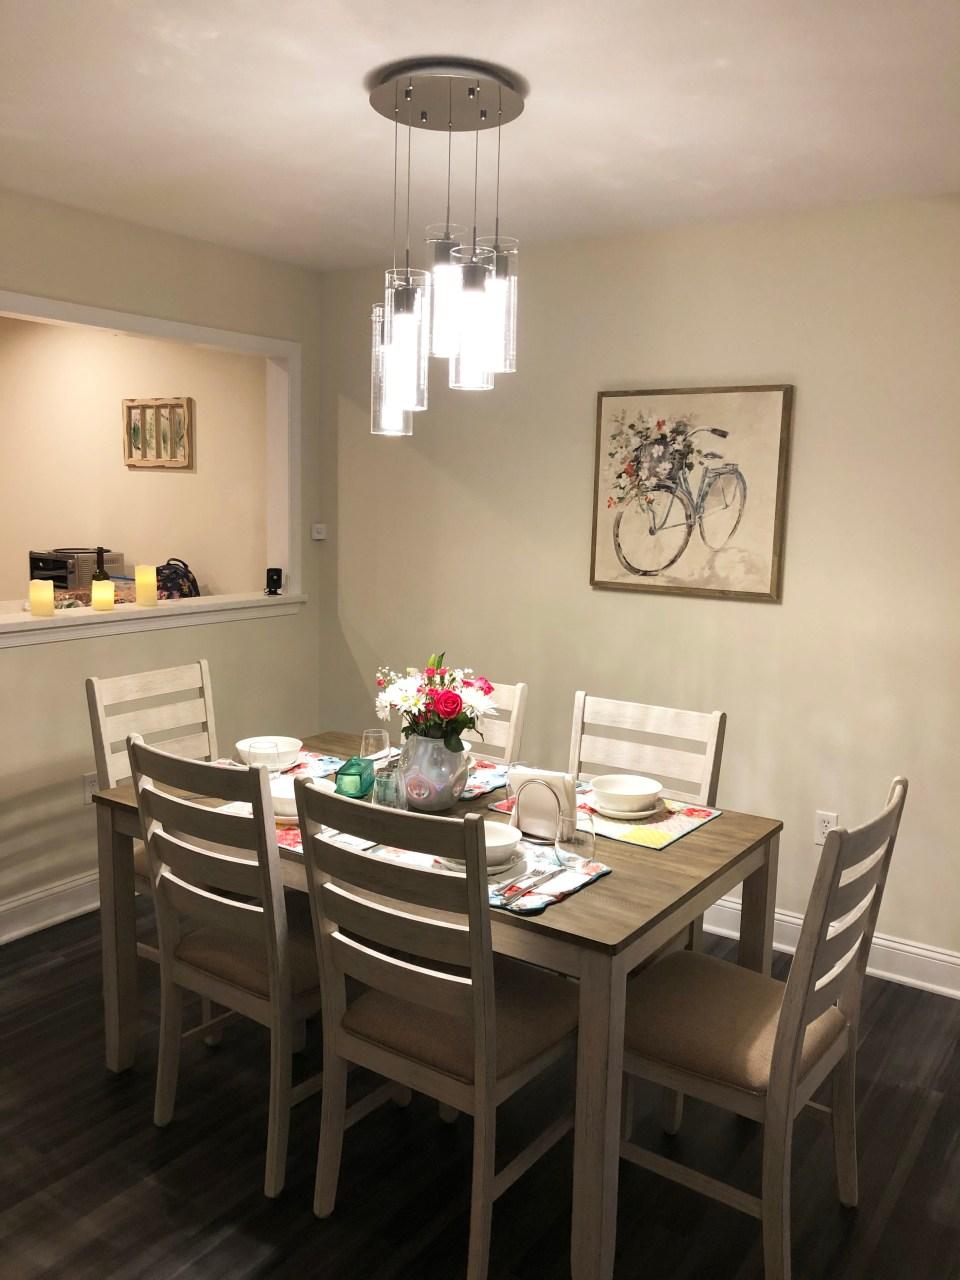 Dining Room Update 1